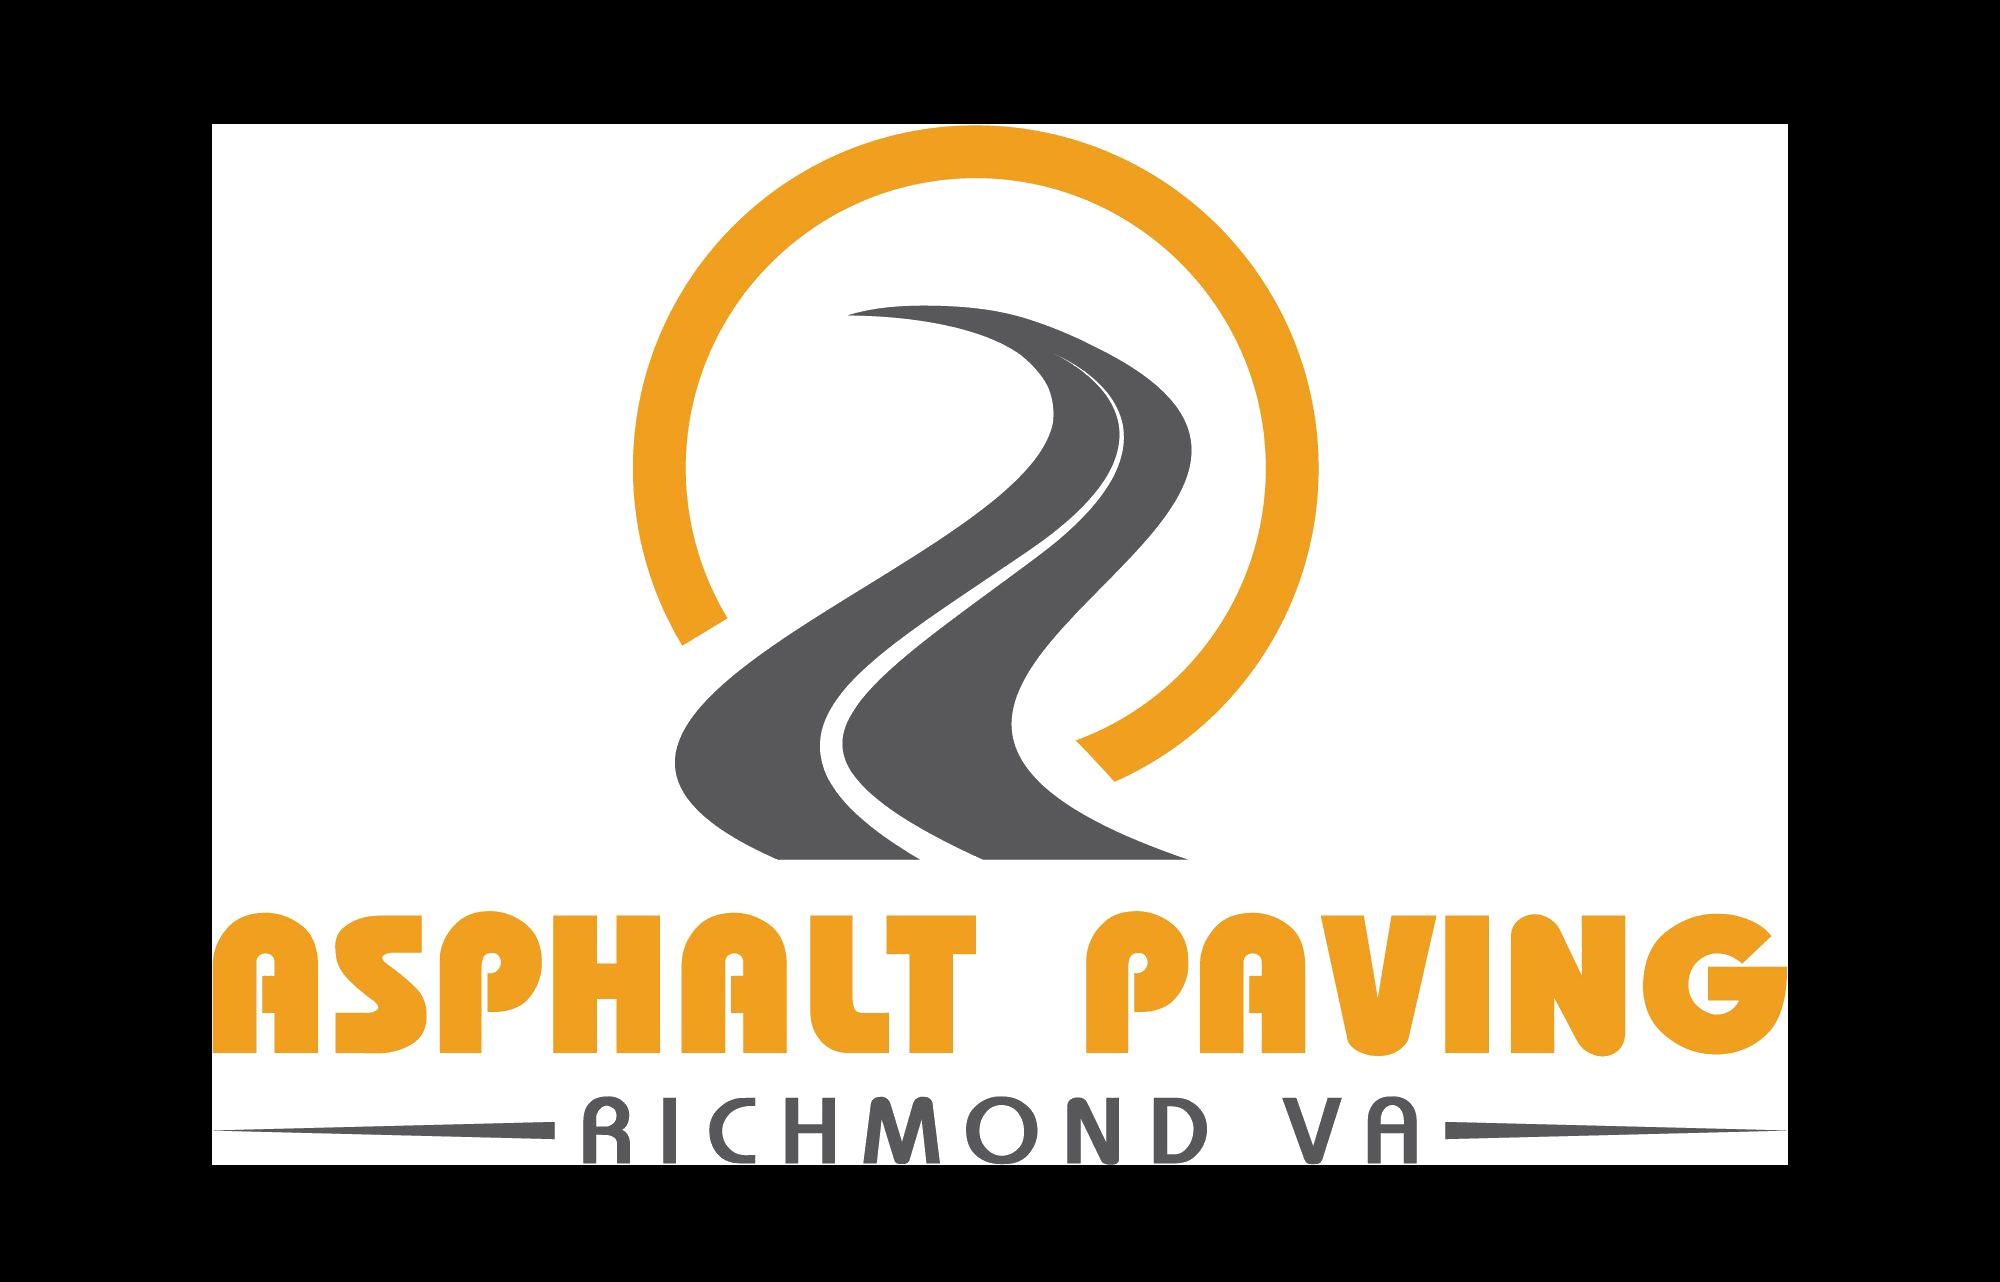 Asphalt Paving Richmond Virginia